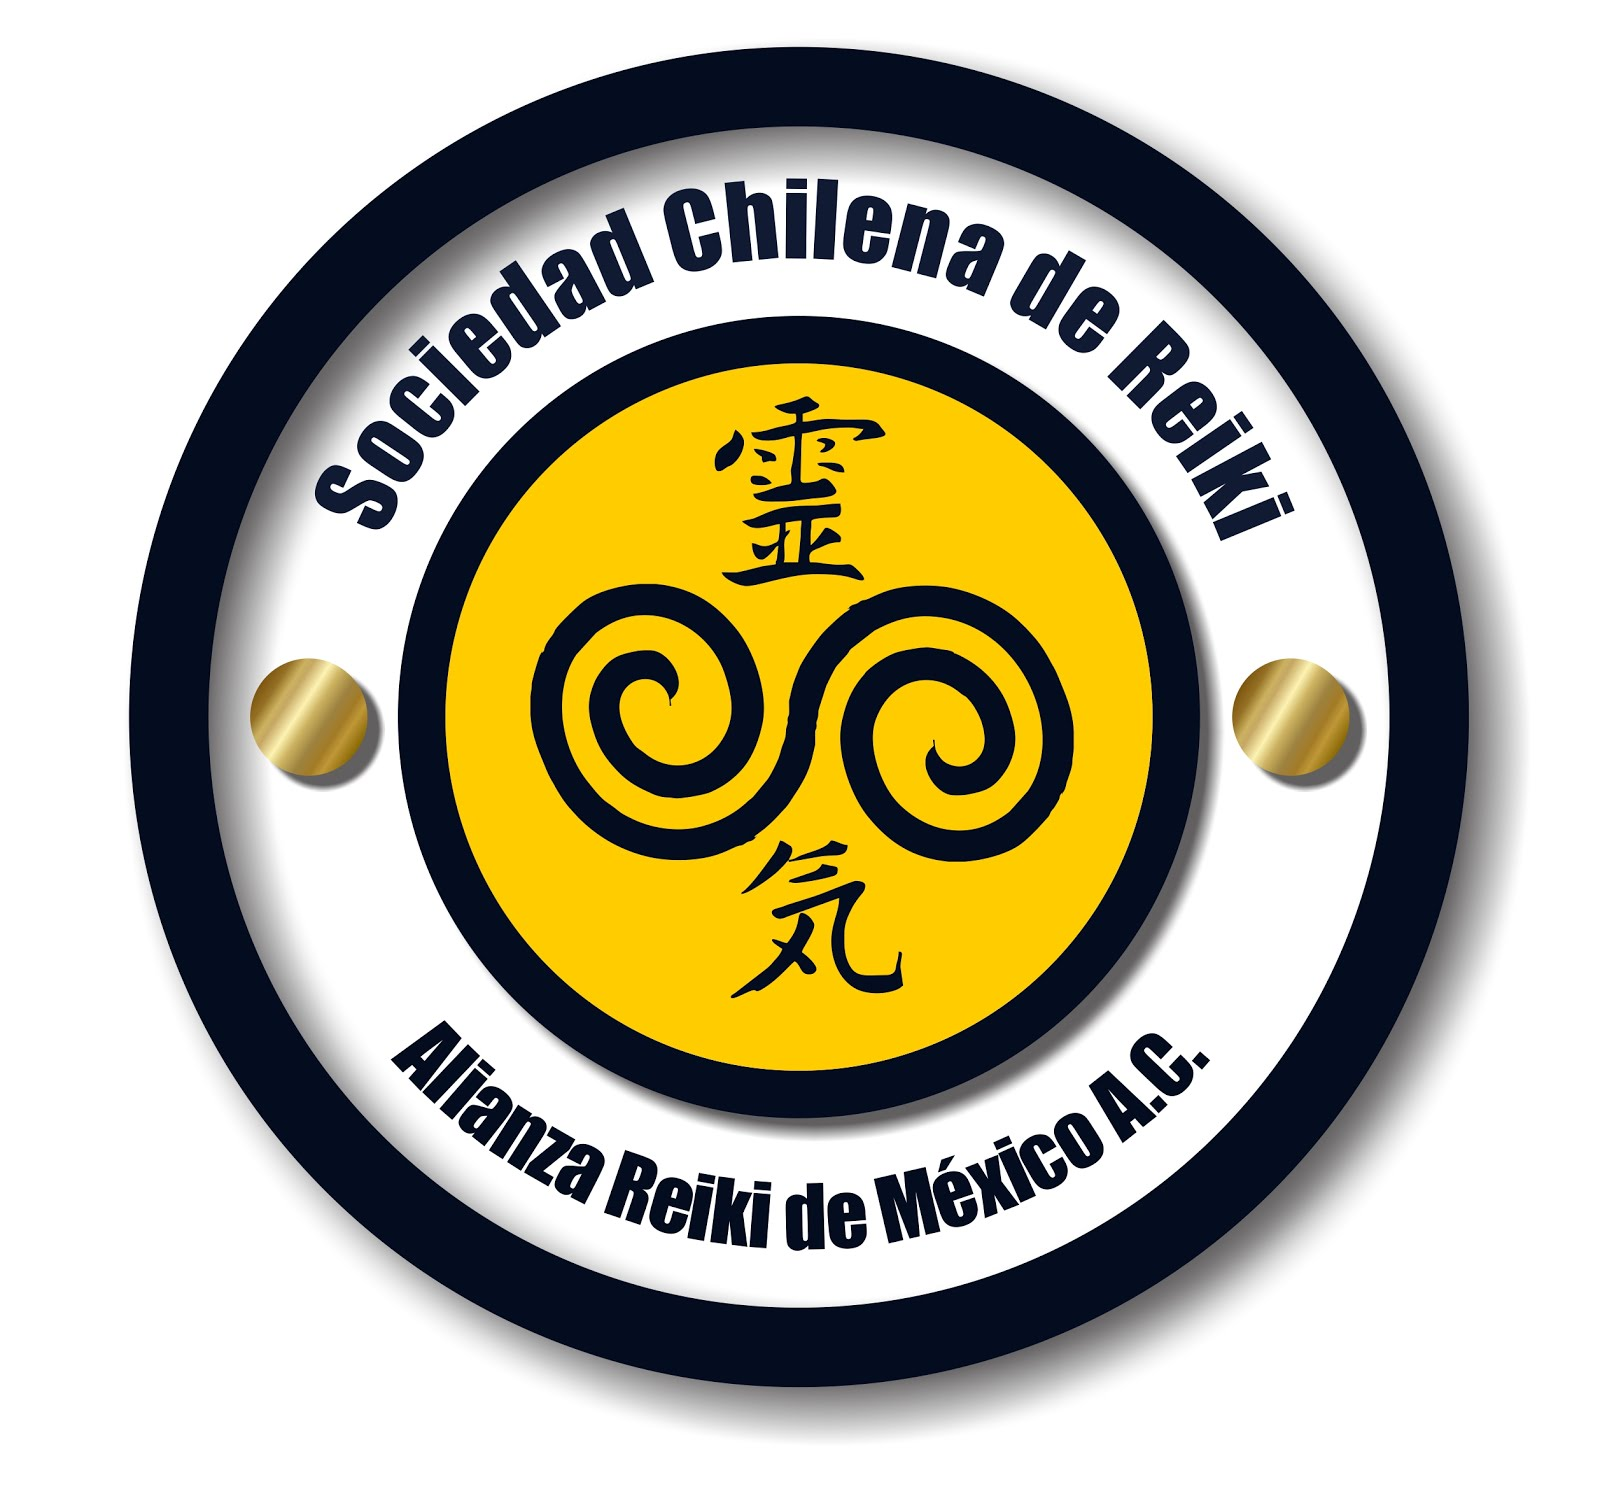 CONVENIO DE COLABORACION CHILE - MEXICO